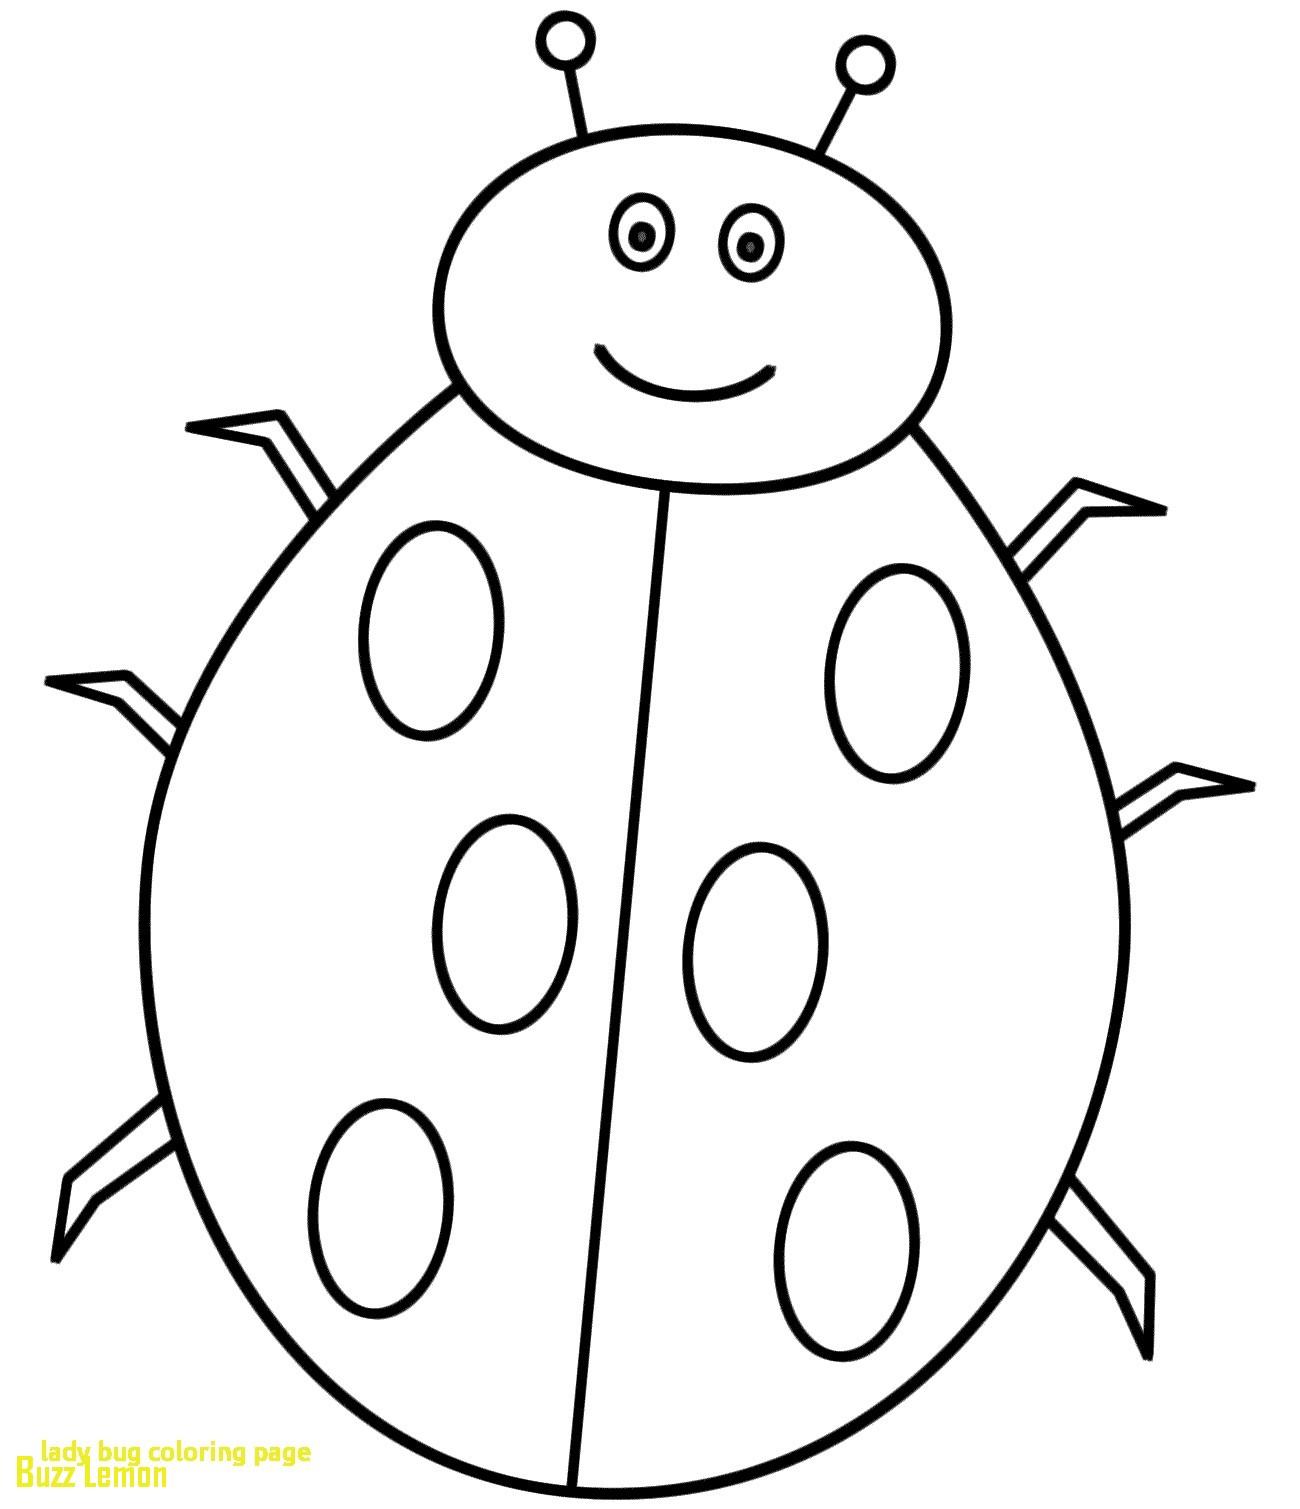 1300x1509 Coloring Page Ladybug Luxury Lady Bug Coloring Page With Ladybug